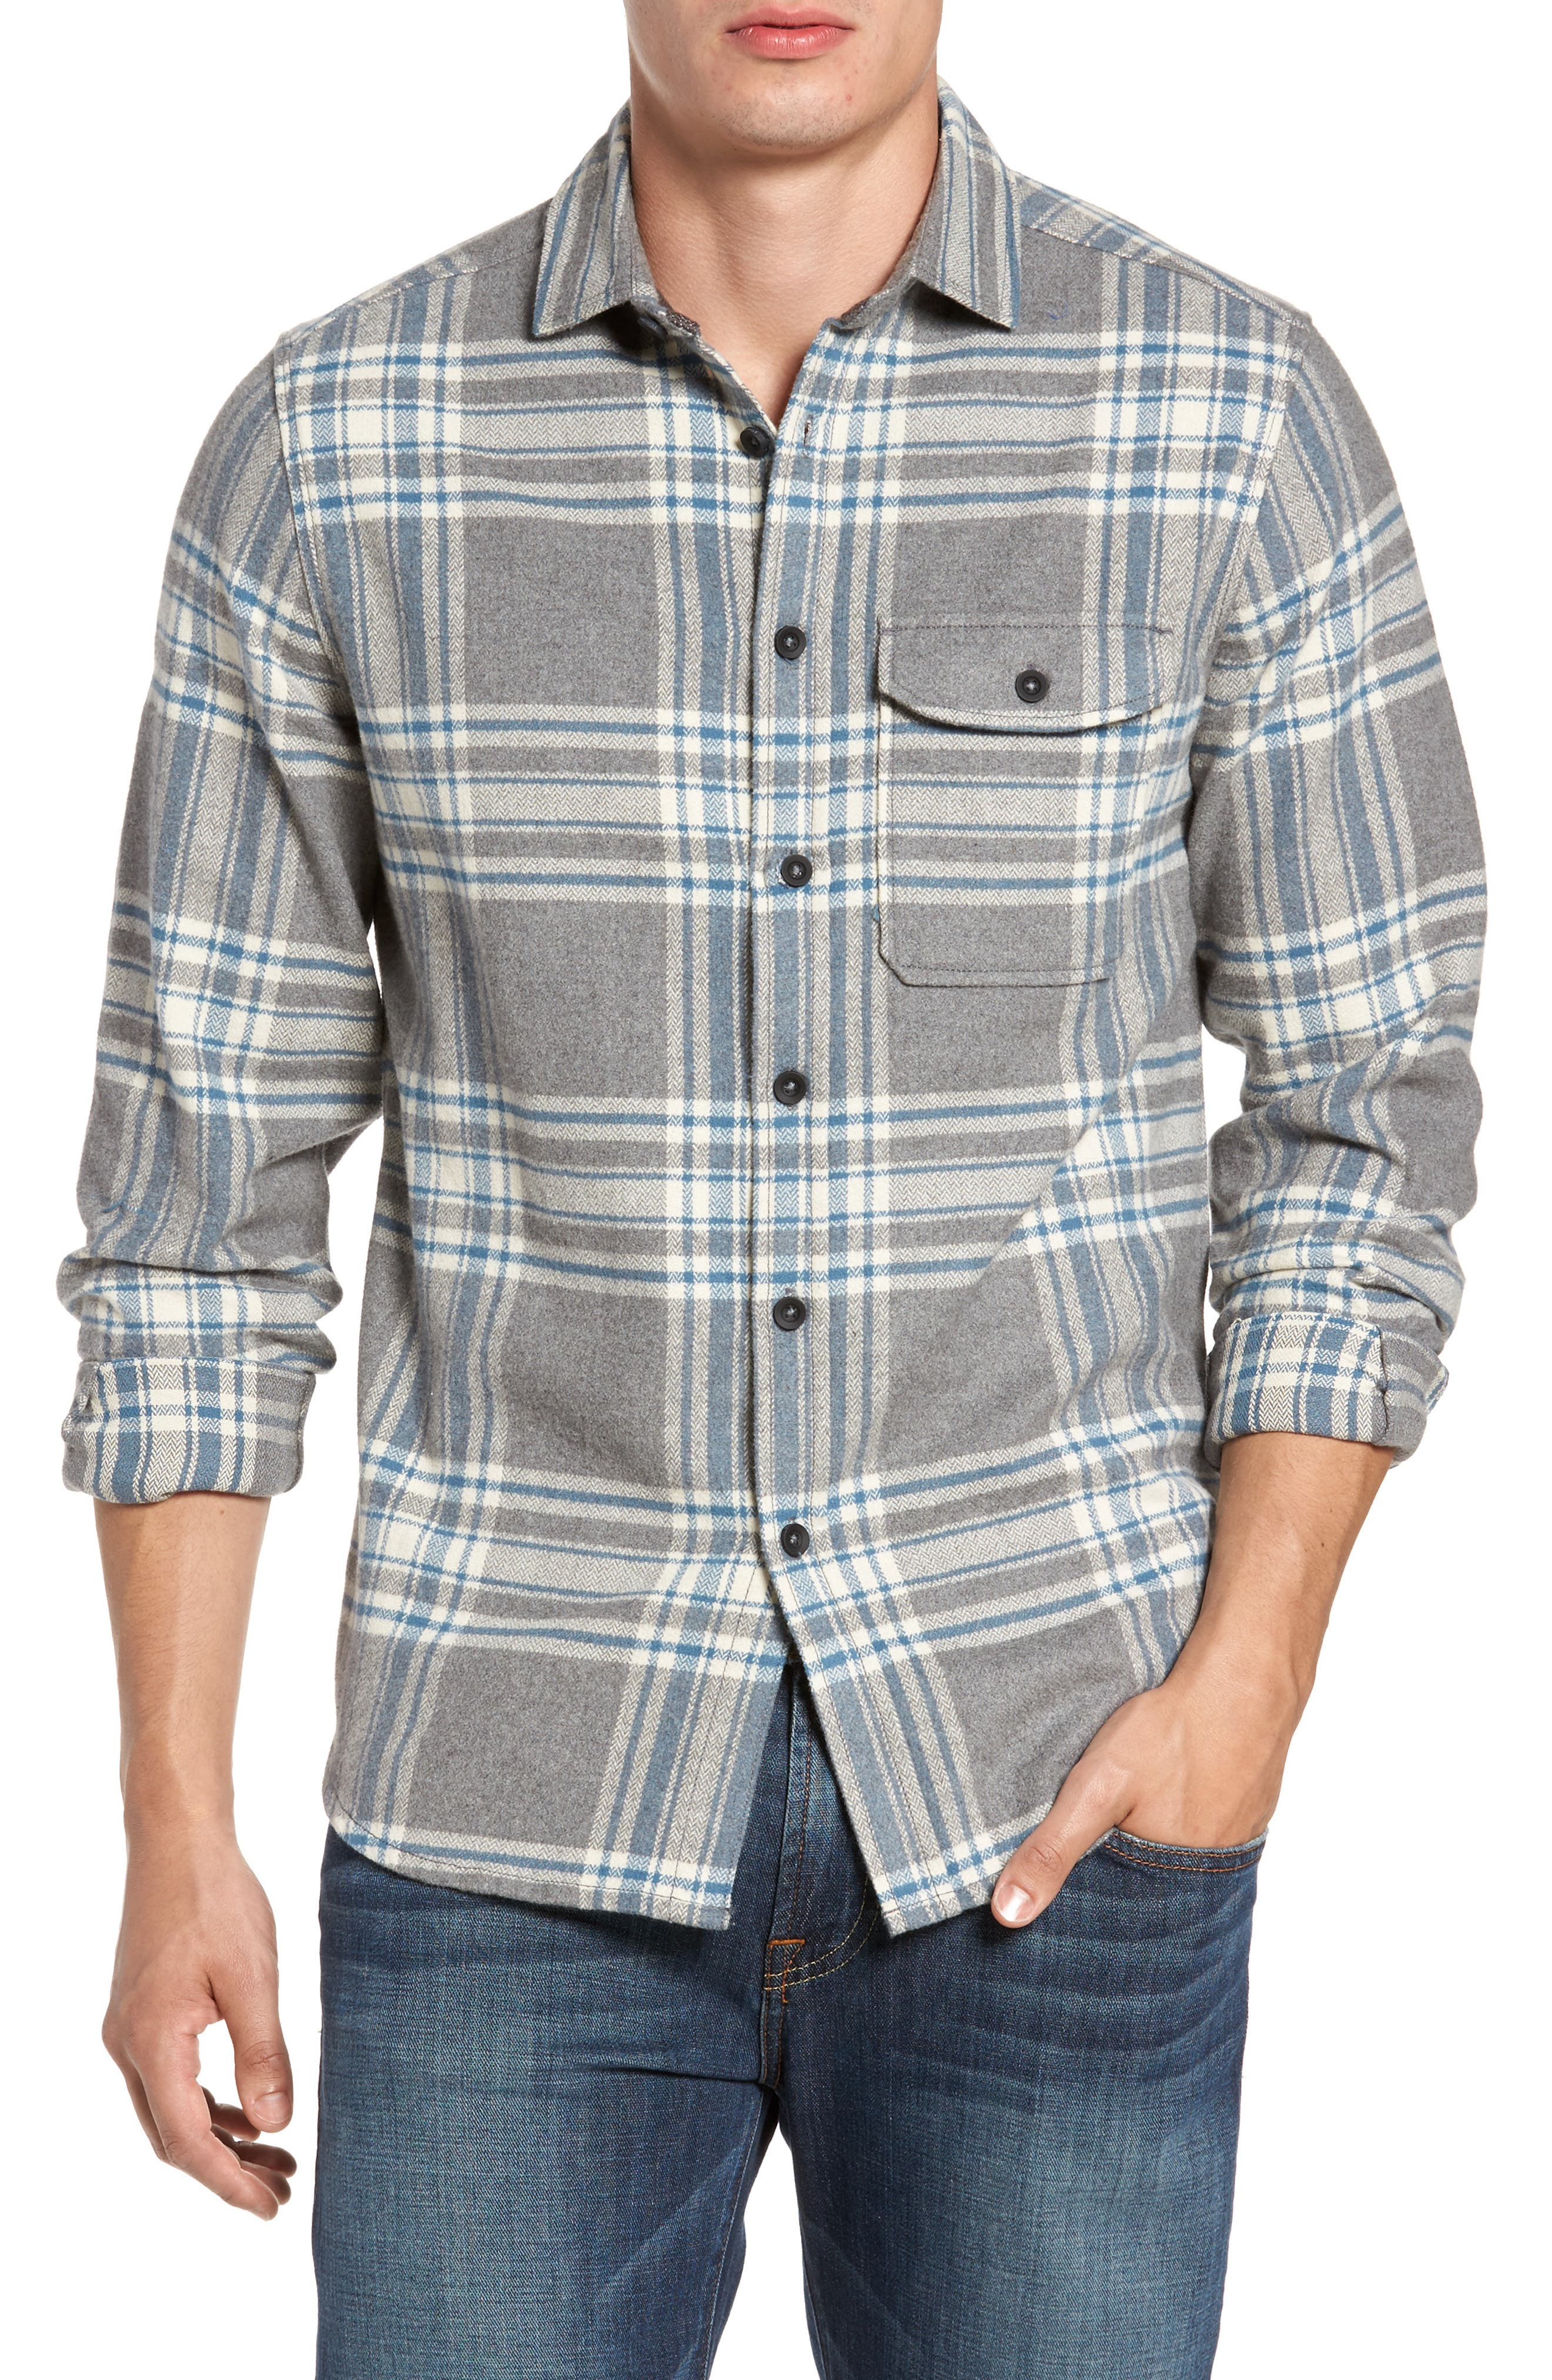 Jeremiah Marin Herringbone Plaid Flannel Shirt